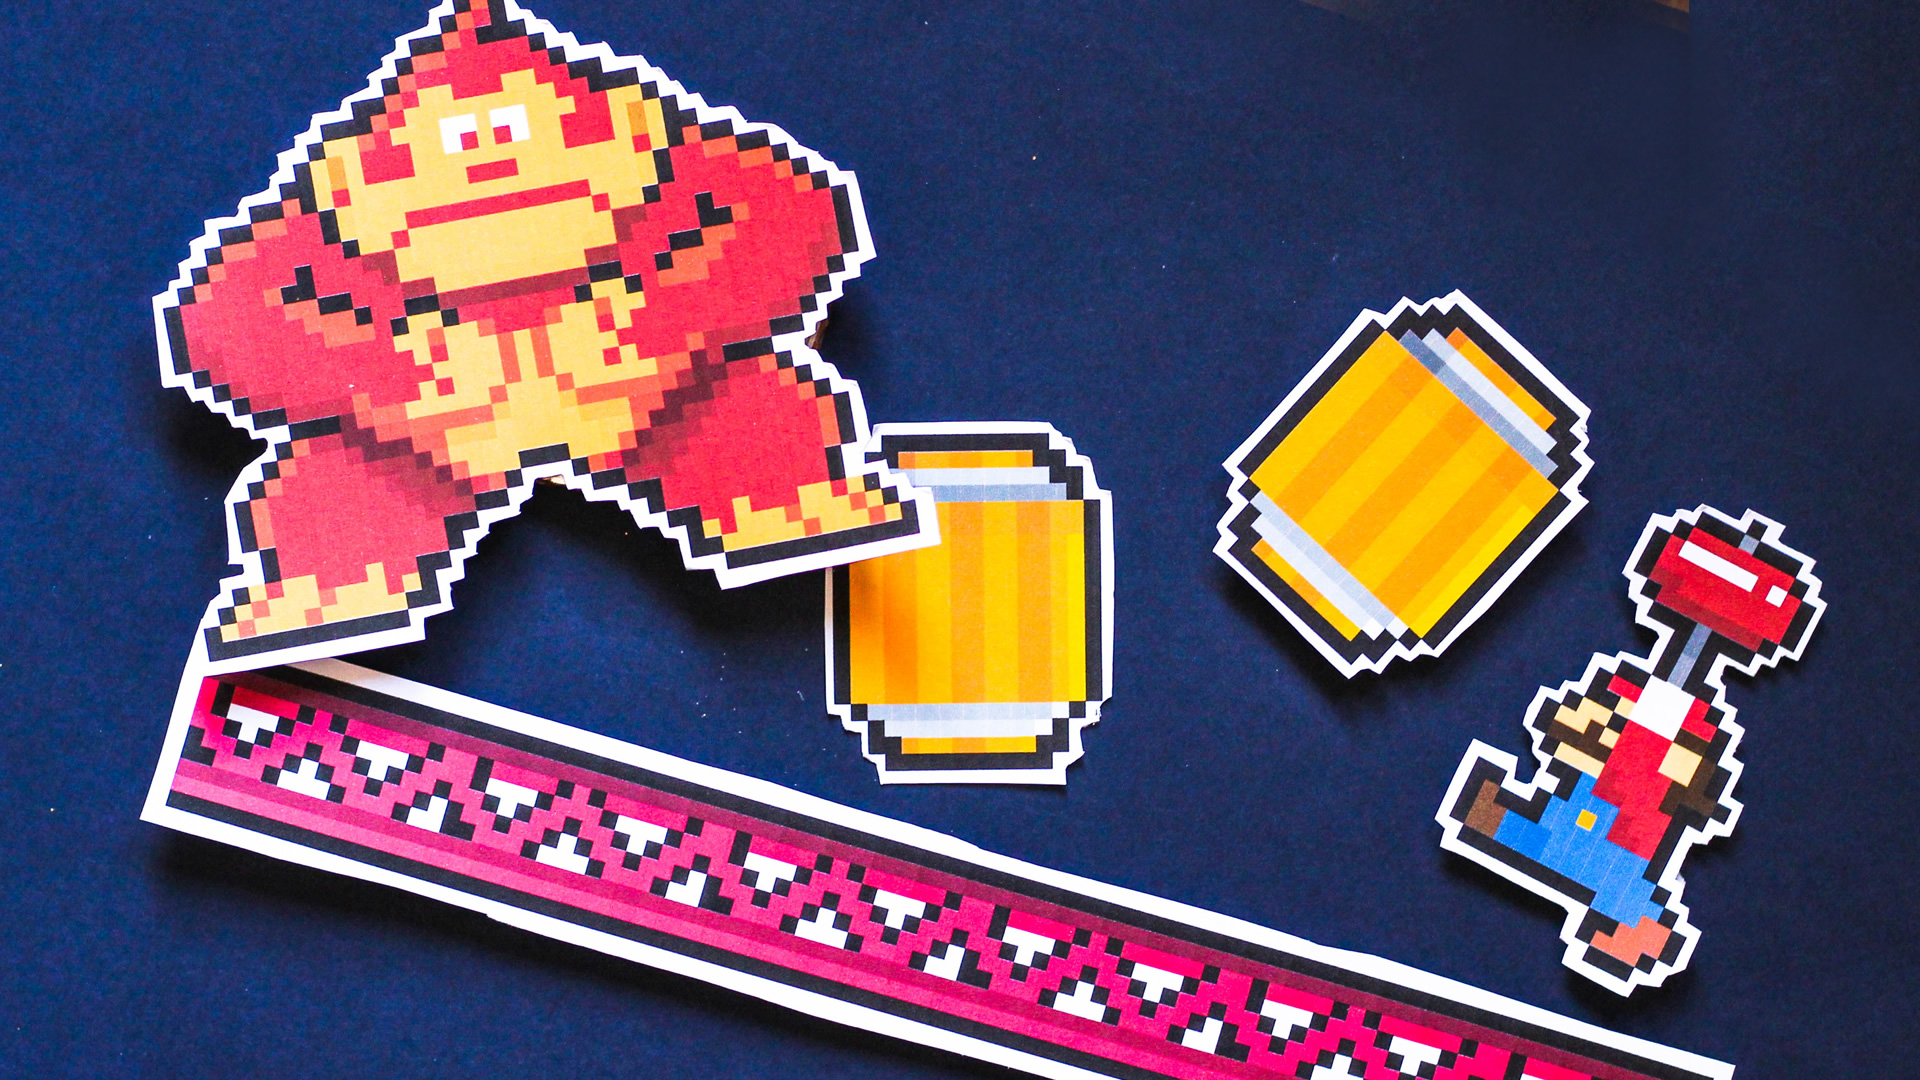 Donkey Kong Arcade History – Donkey Kong '94 Turns 25